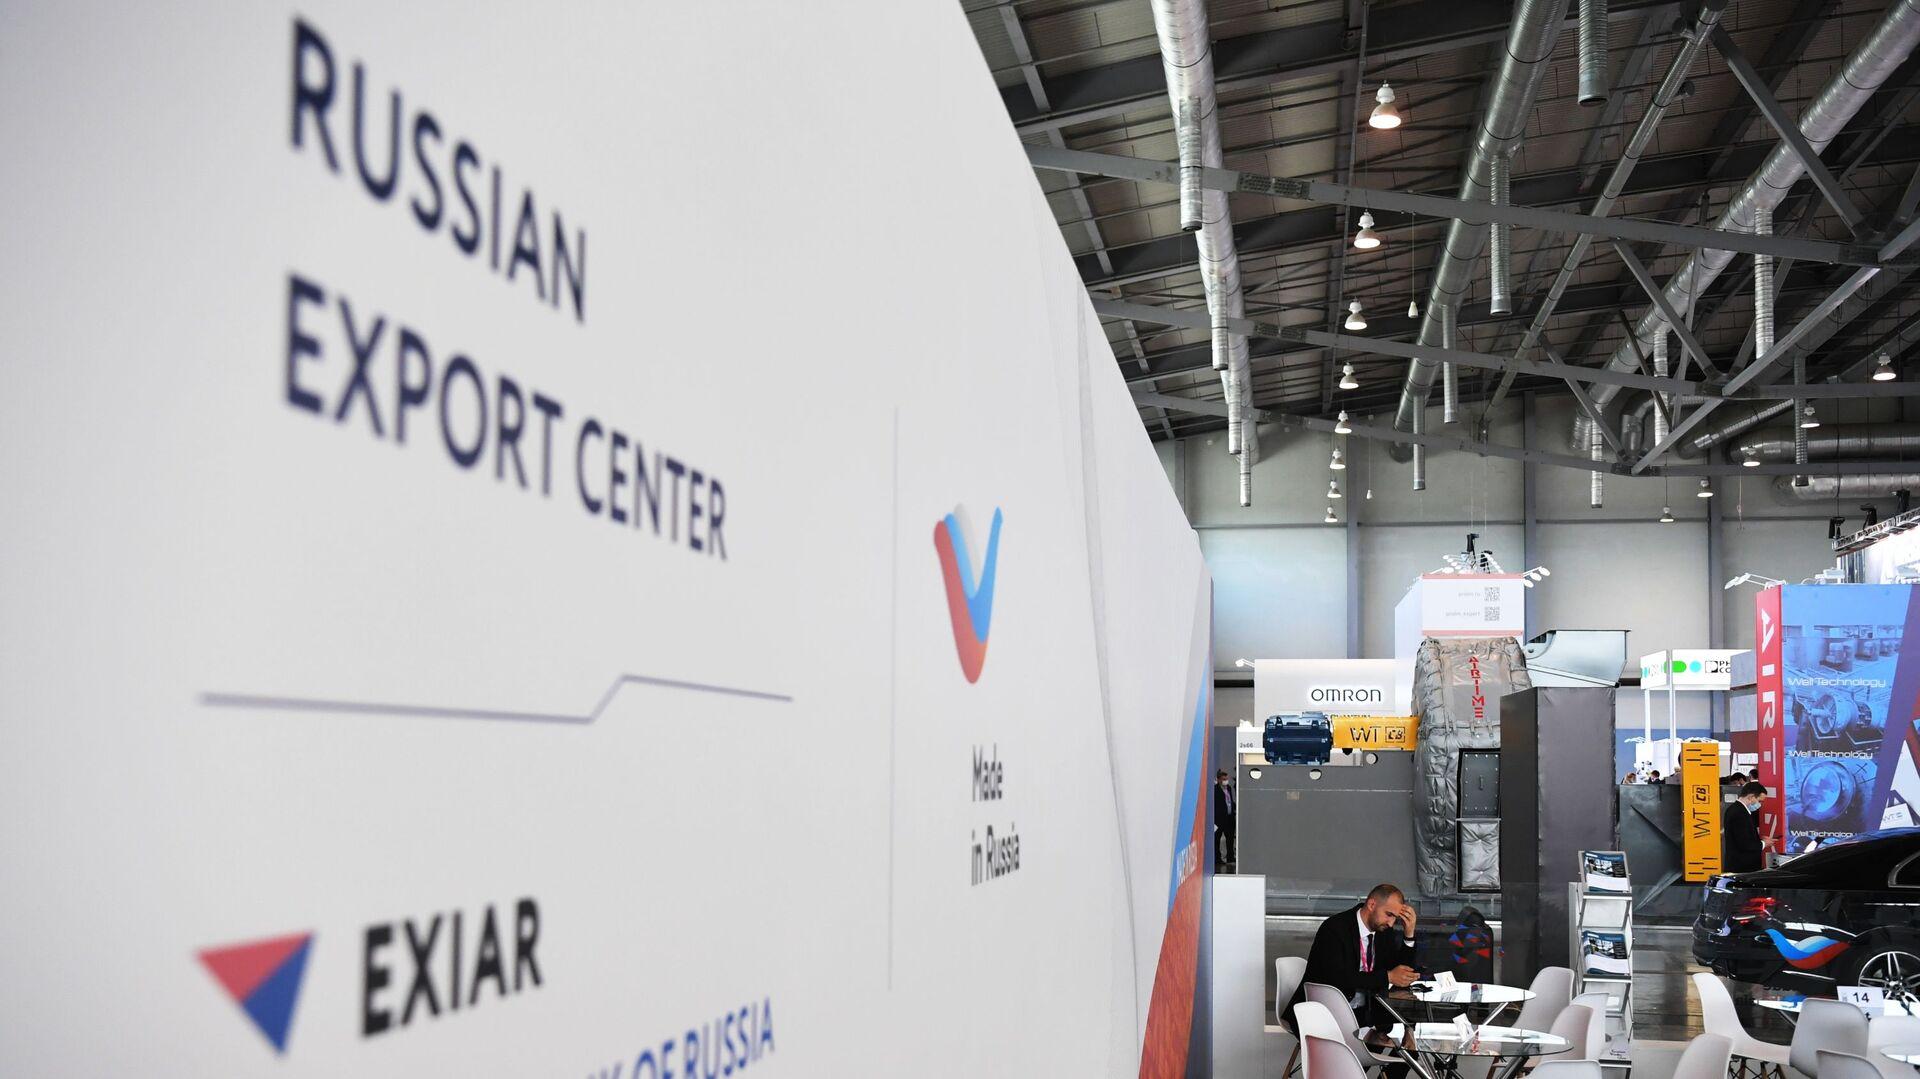 Russian Export Centre - Sputnik International, 1920, 20.09.2021